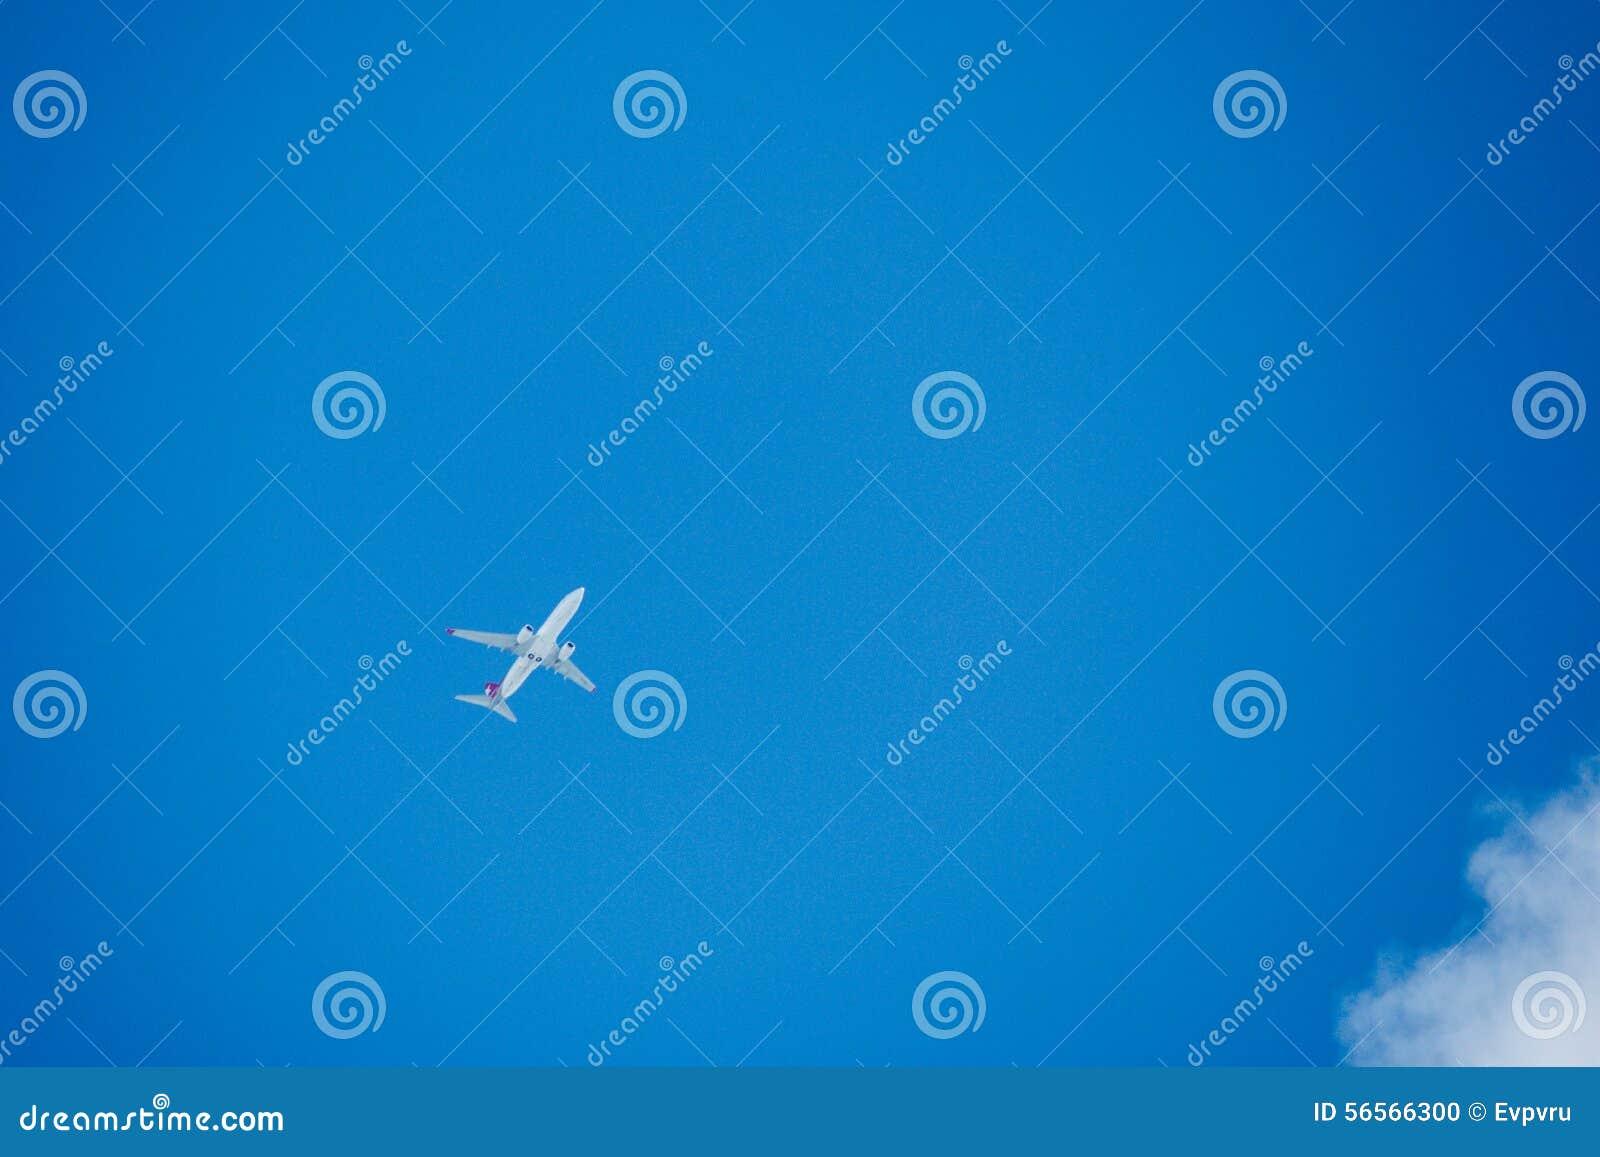 Download Αεροπλάνο στοκ εικόνες. εικόνα από σύννεφο, επιβάτης - 56566300